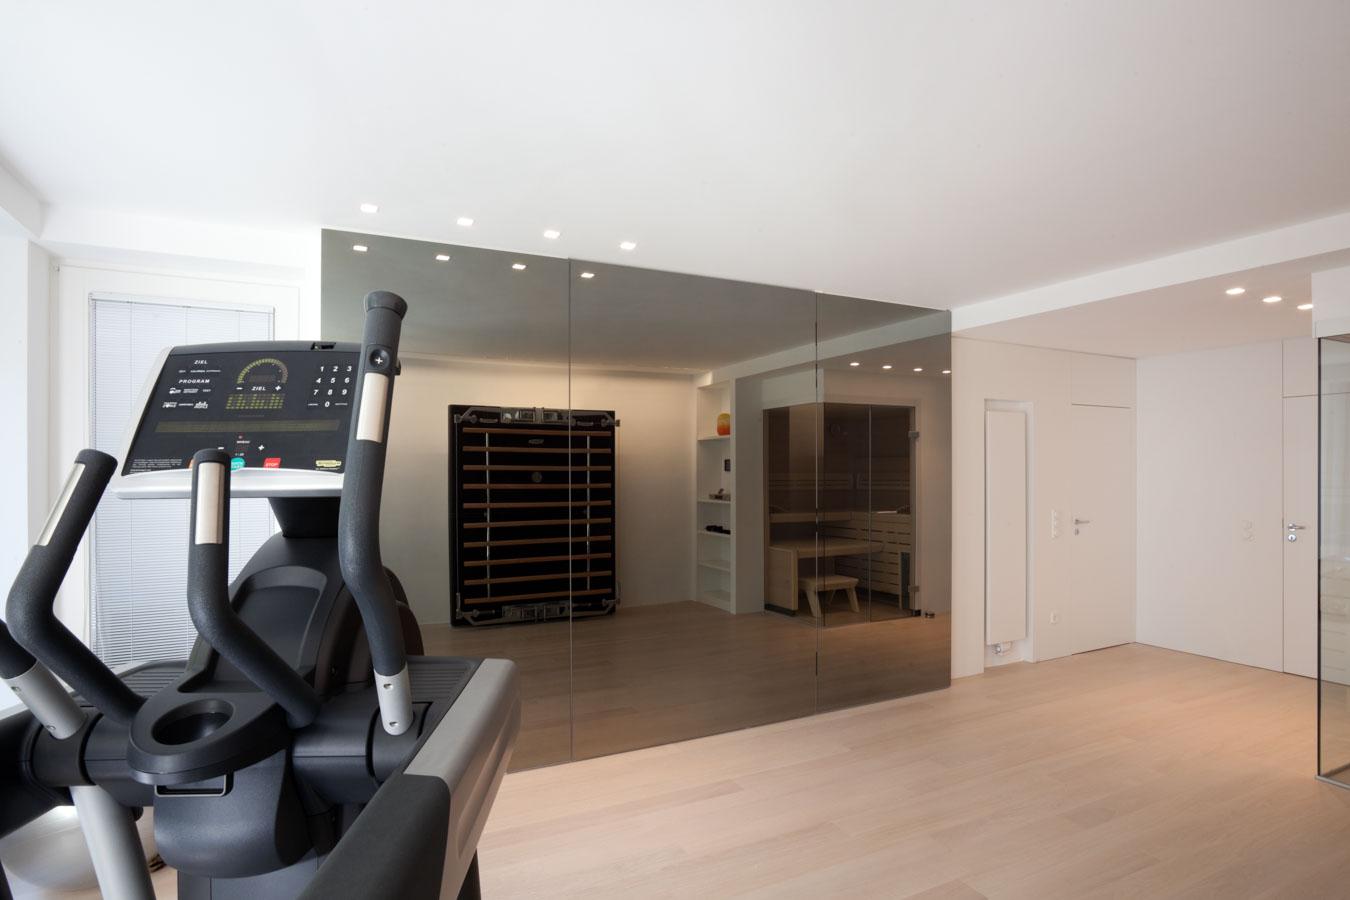 stadtvilla innenarchitektur. Black Bedroom Furniture Sets. Home Design Ideas